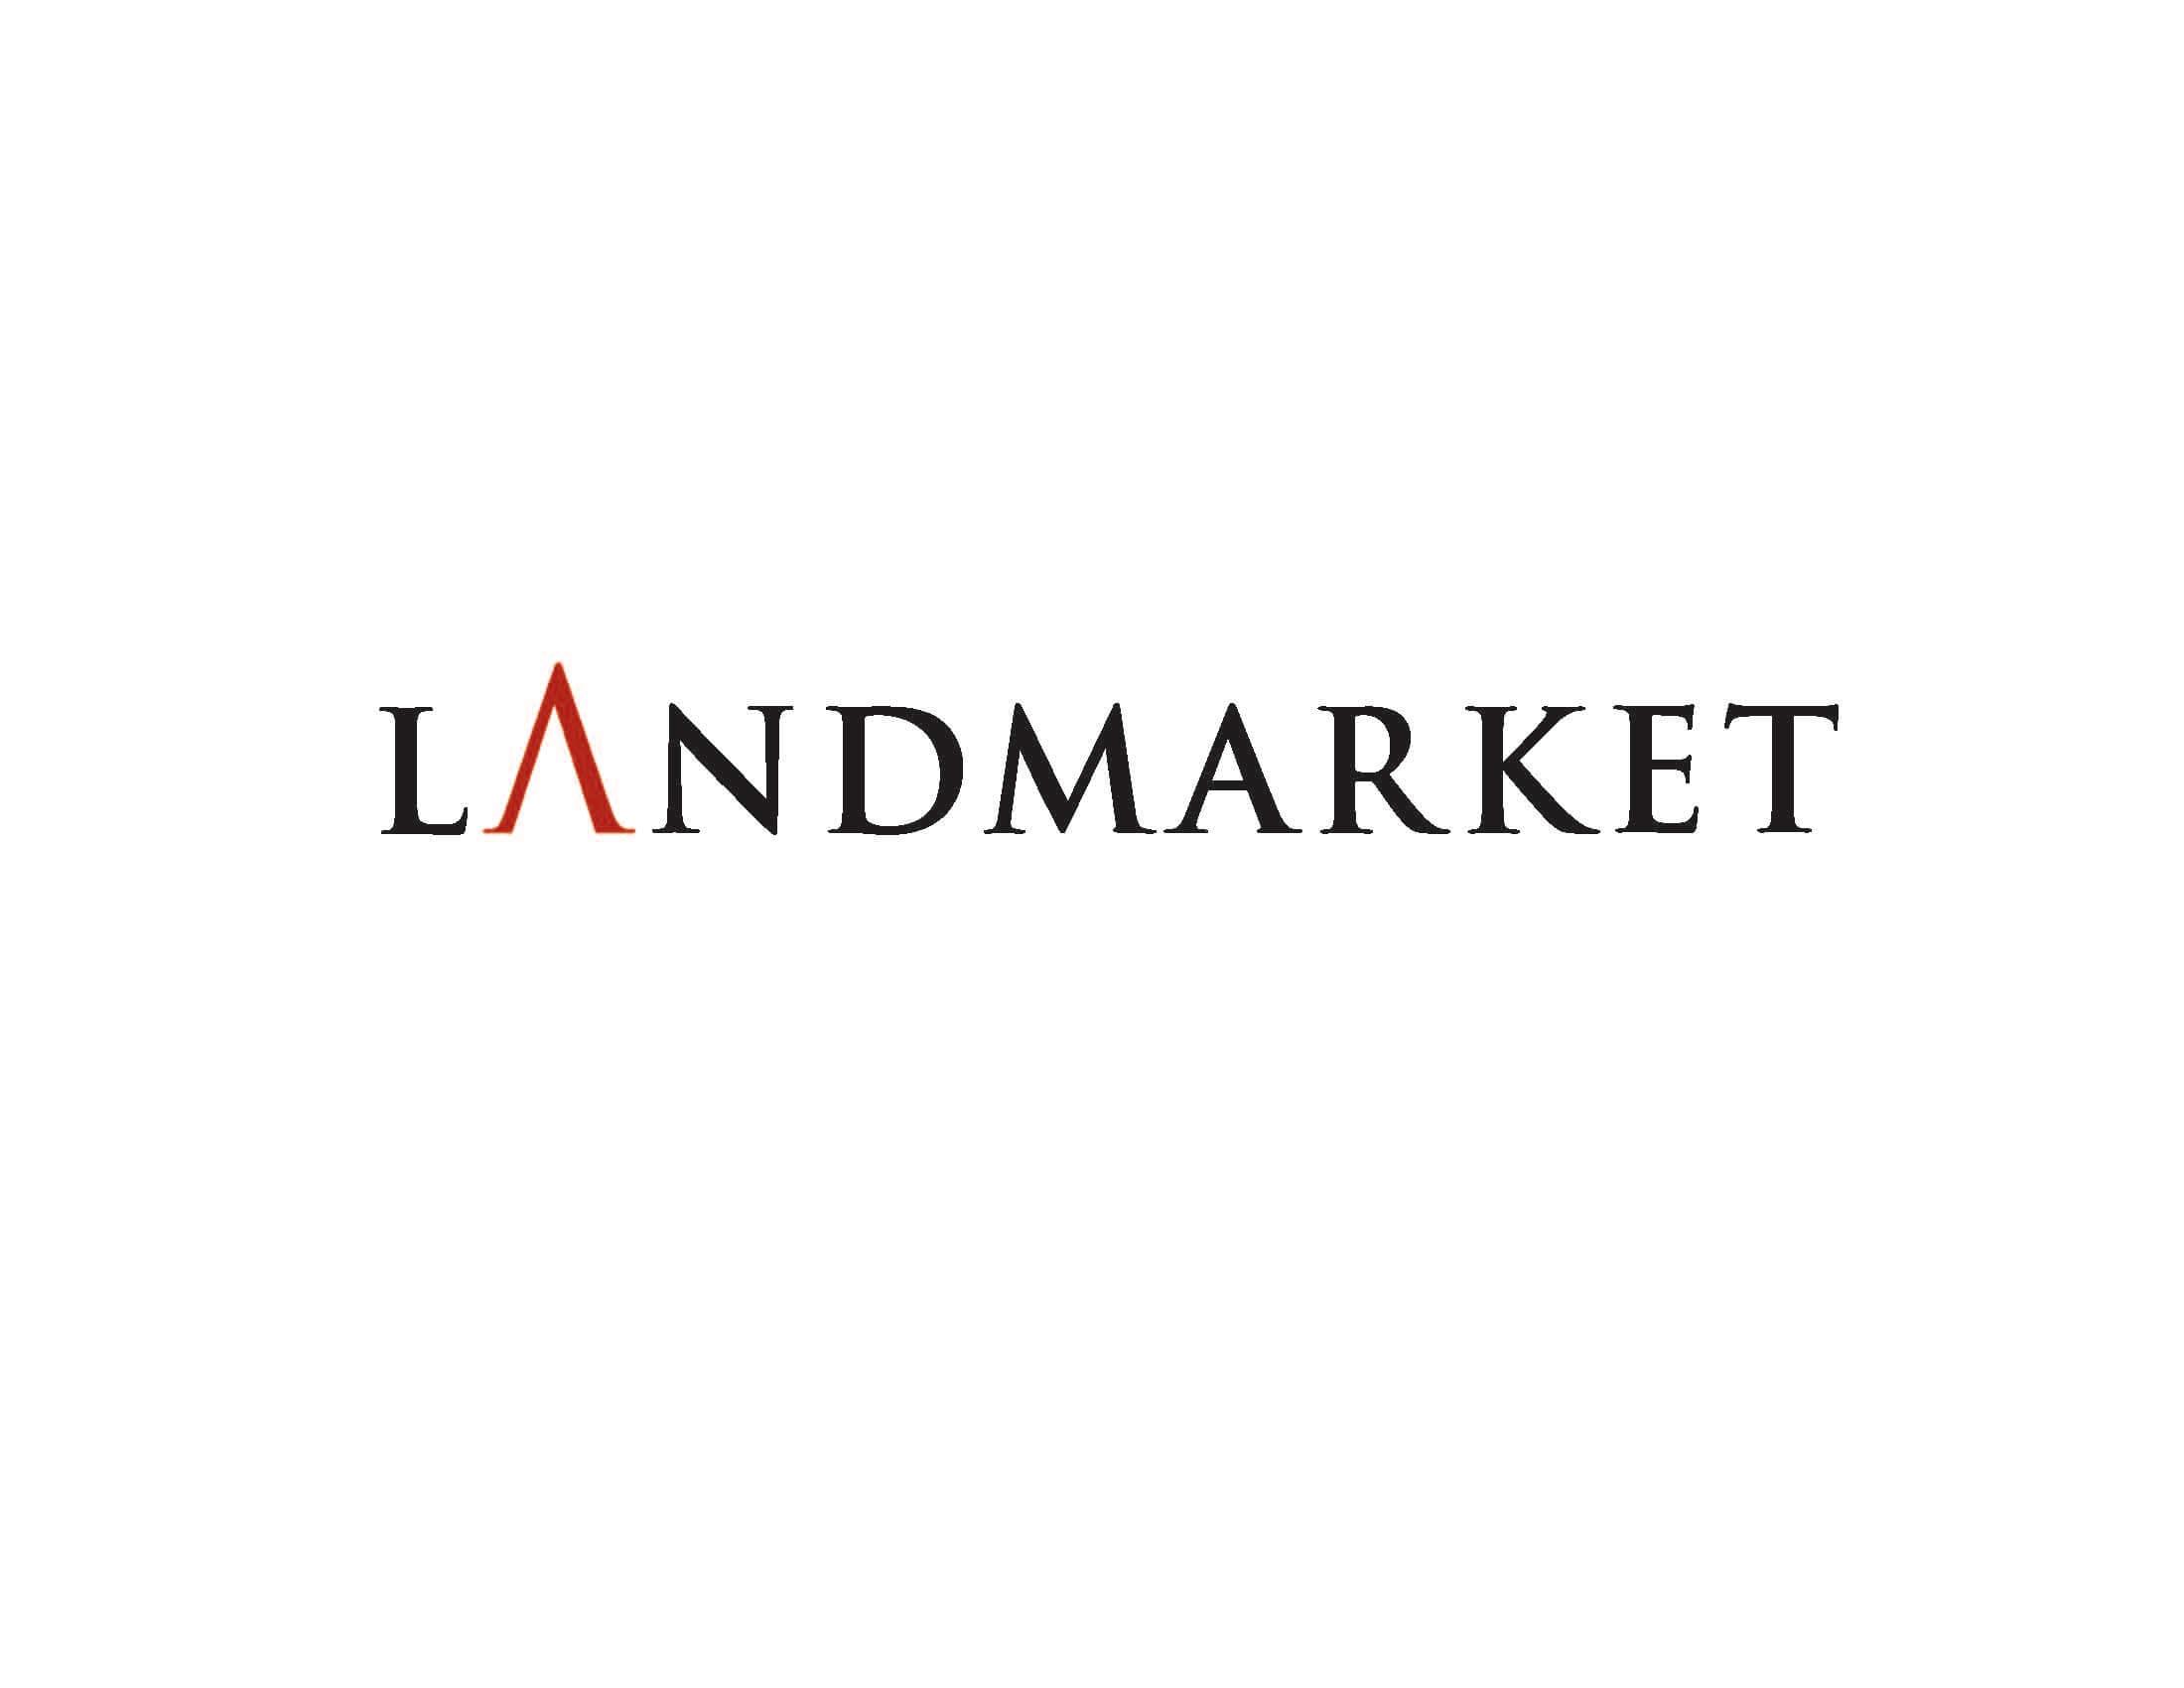 landmarket logo